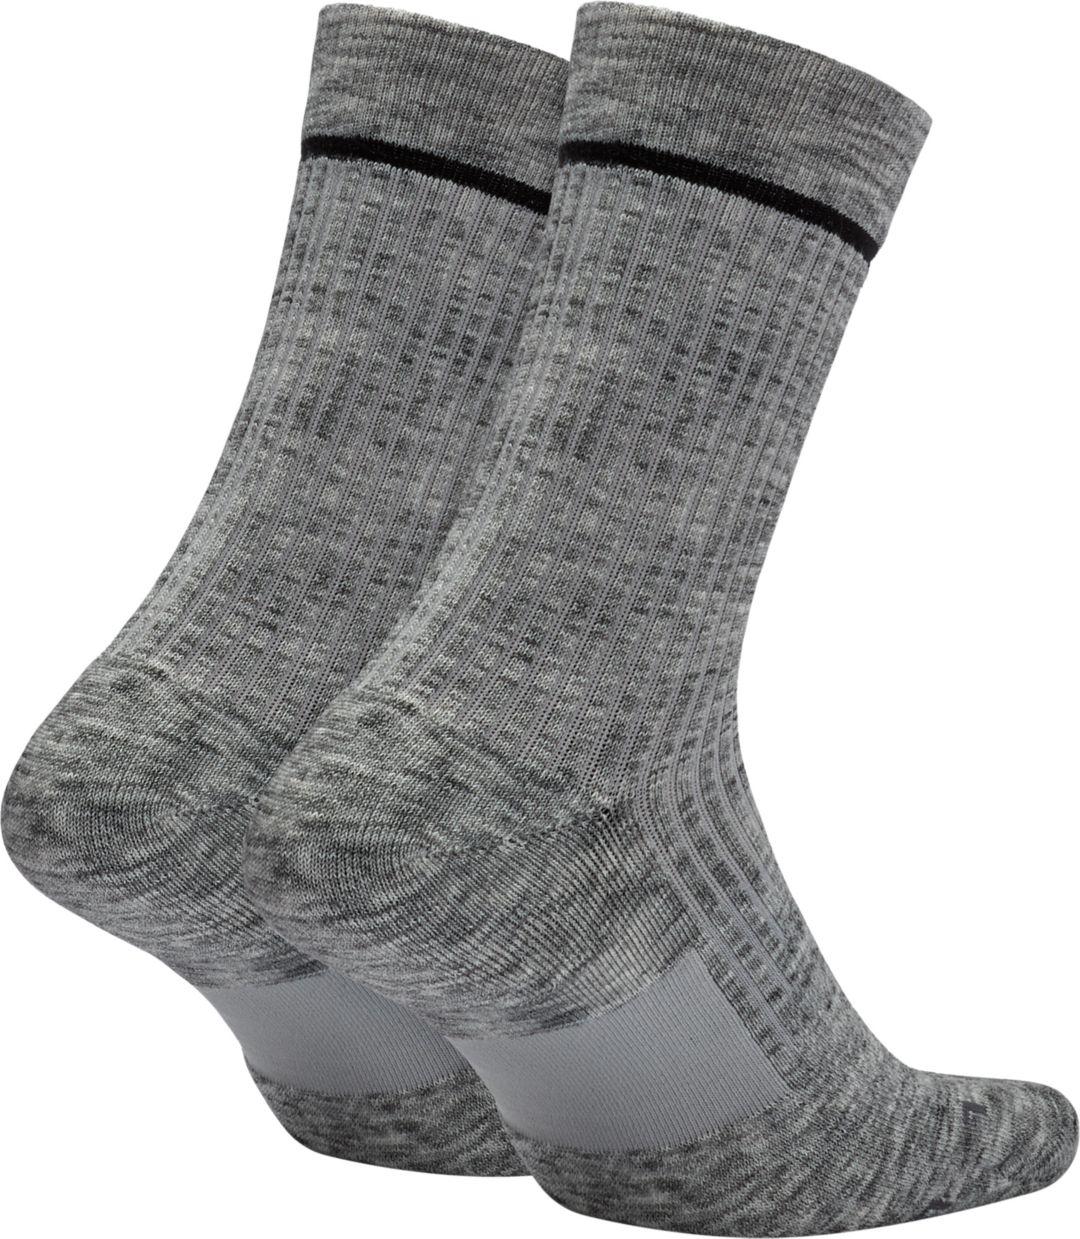 c90de5354 Nike Sneaker Sox Essential Crew Socks 2 Pack. noImageFound. Previous. 1. 2